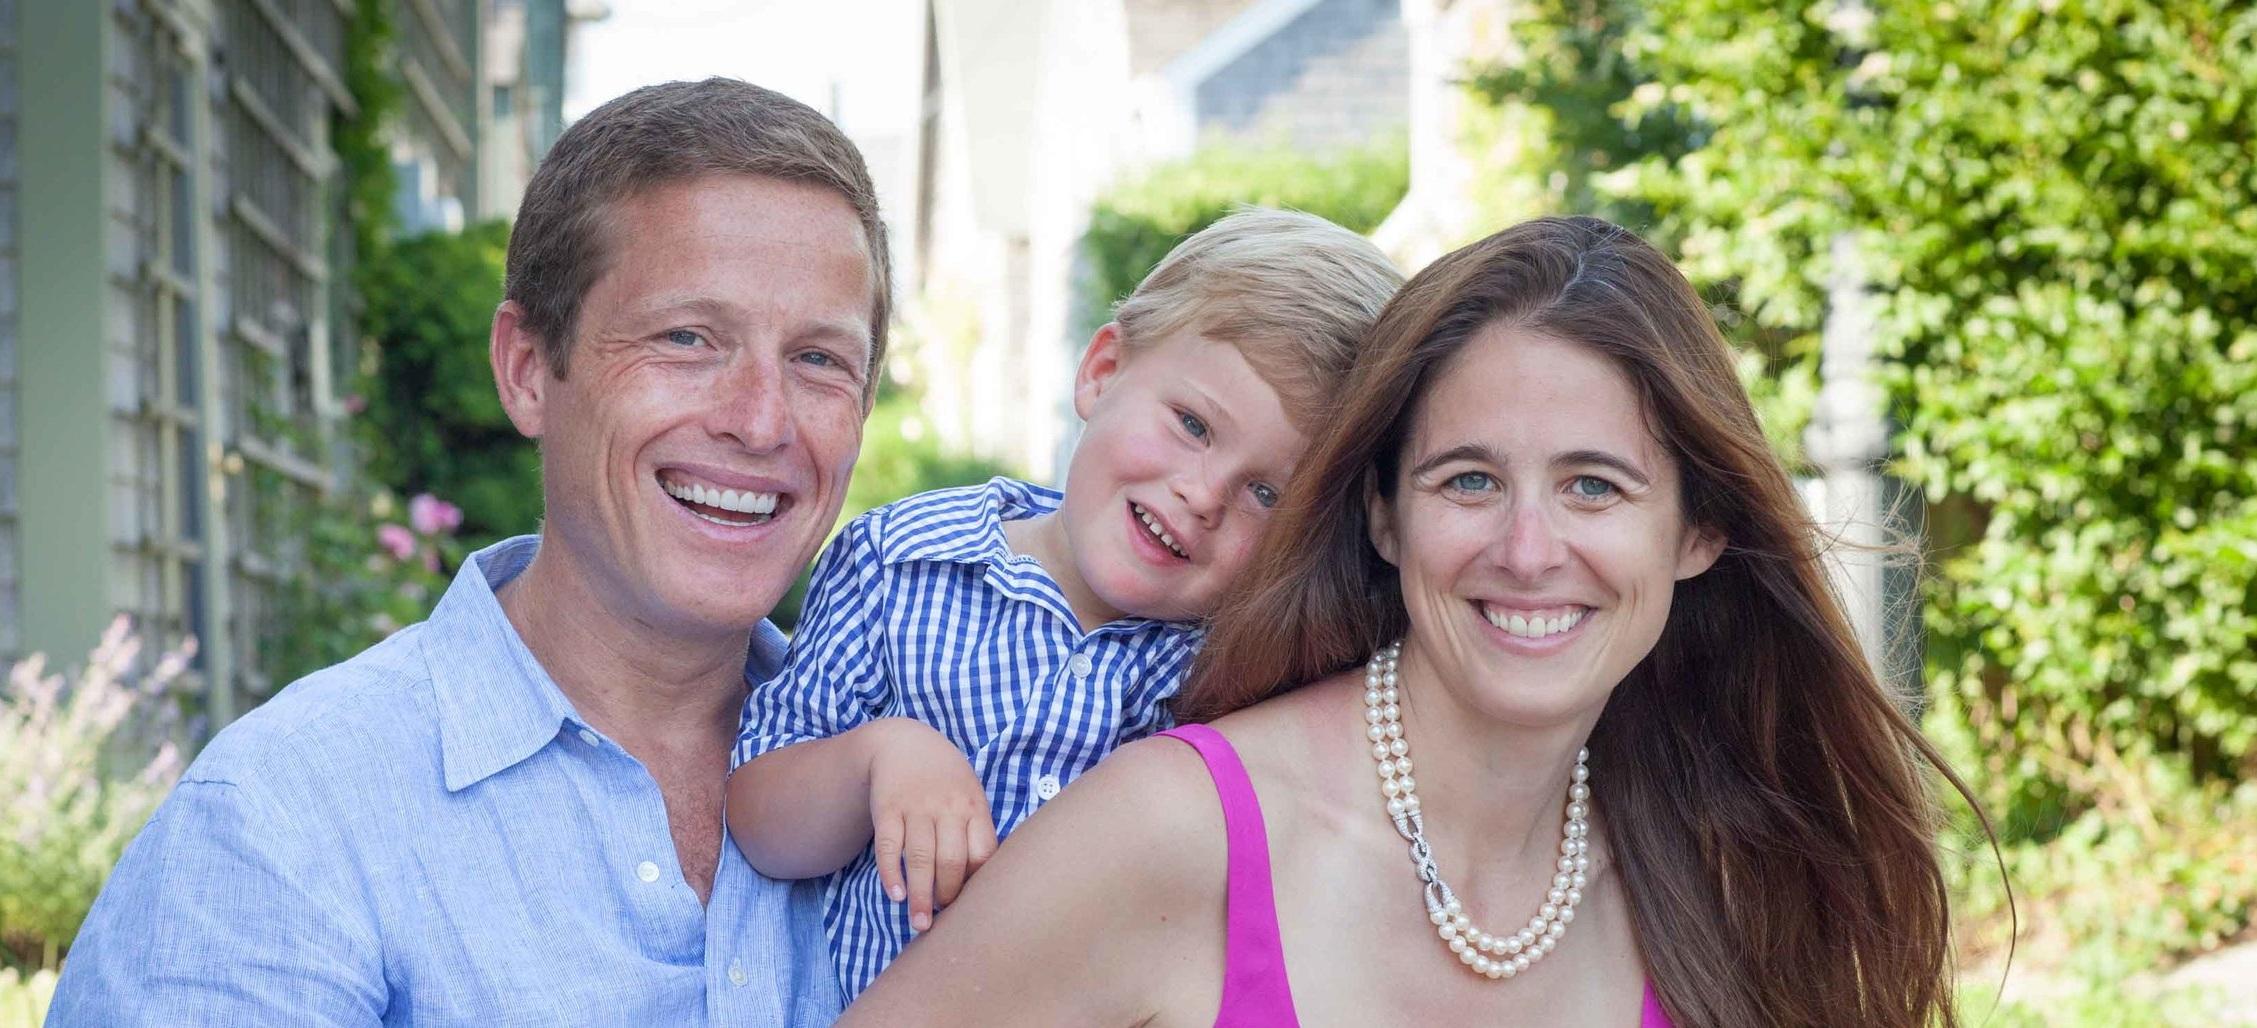 Family photo, summer 2017